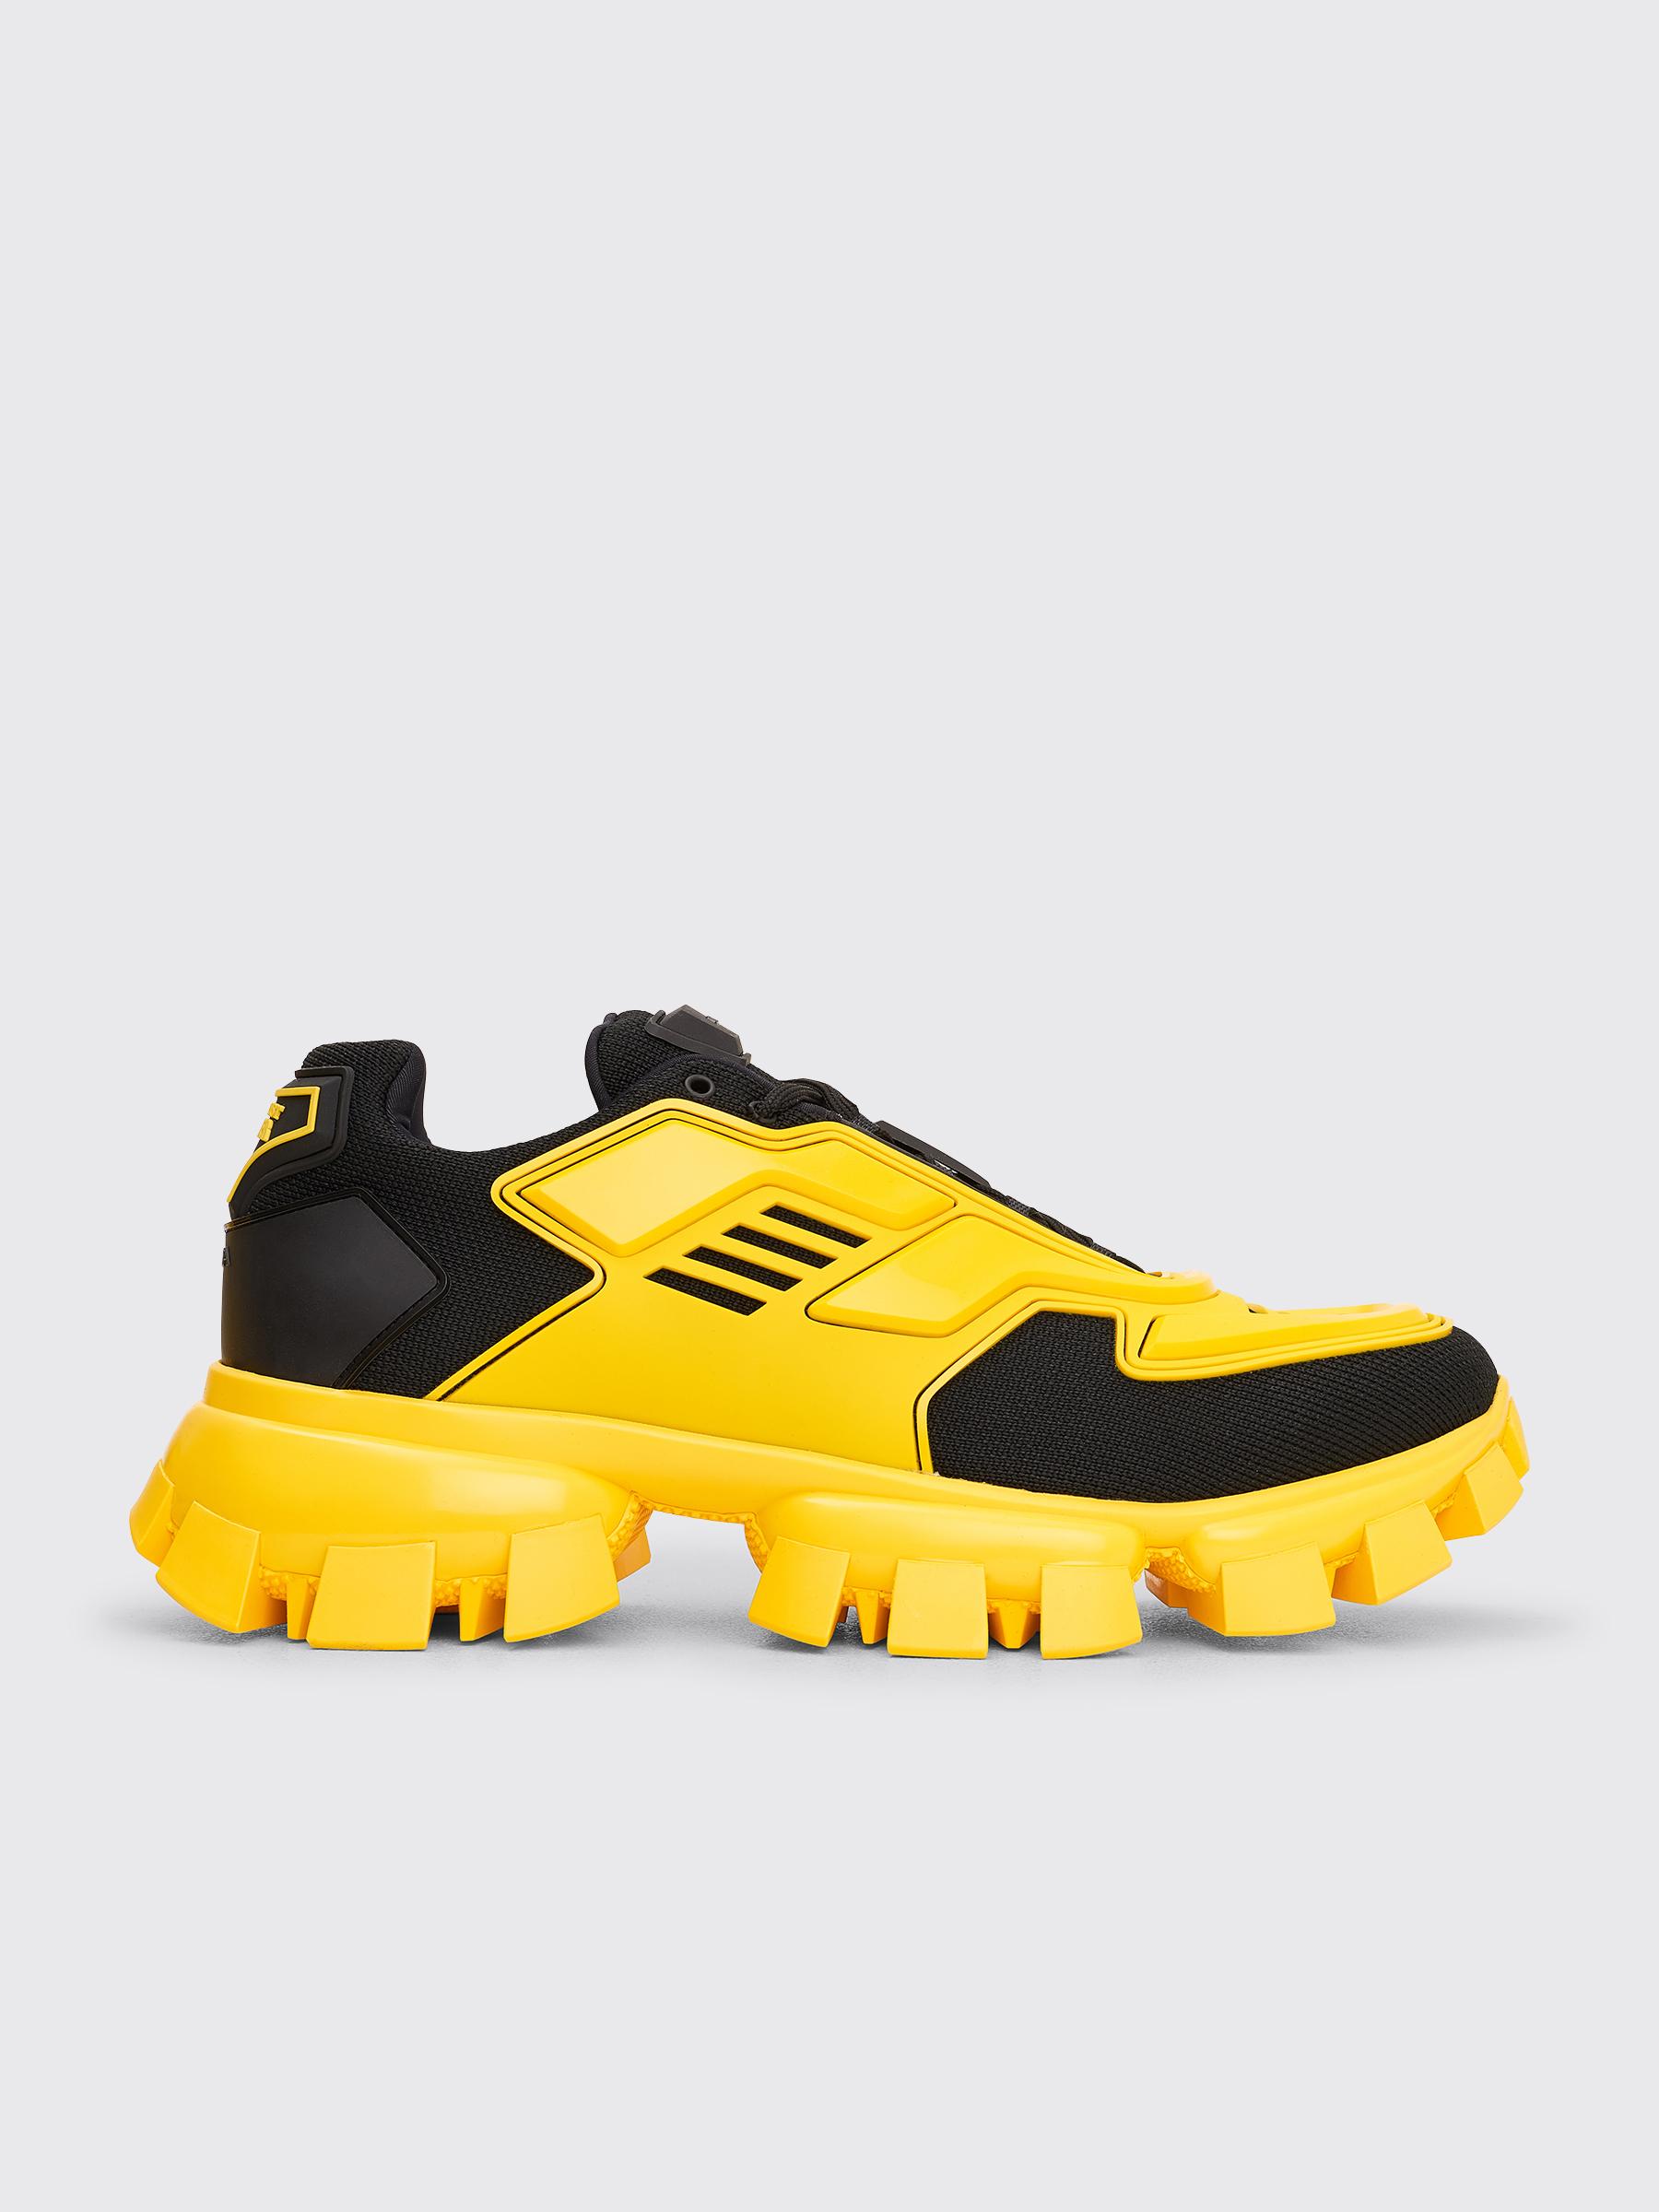 Prada Cloudbust Thunder Knit Sneakers Black Yellow